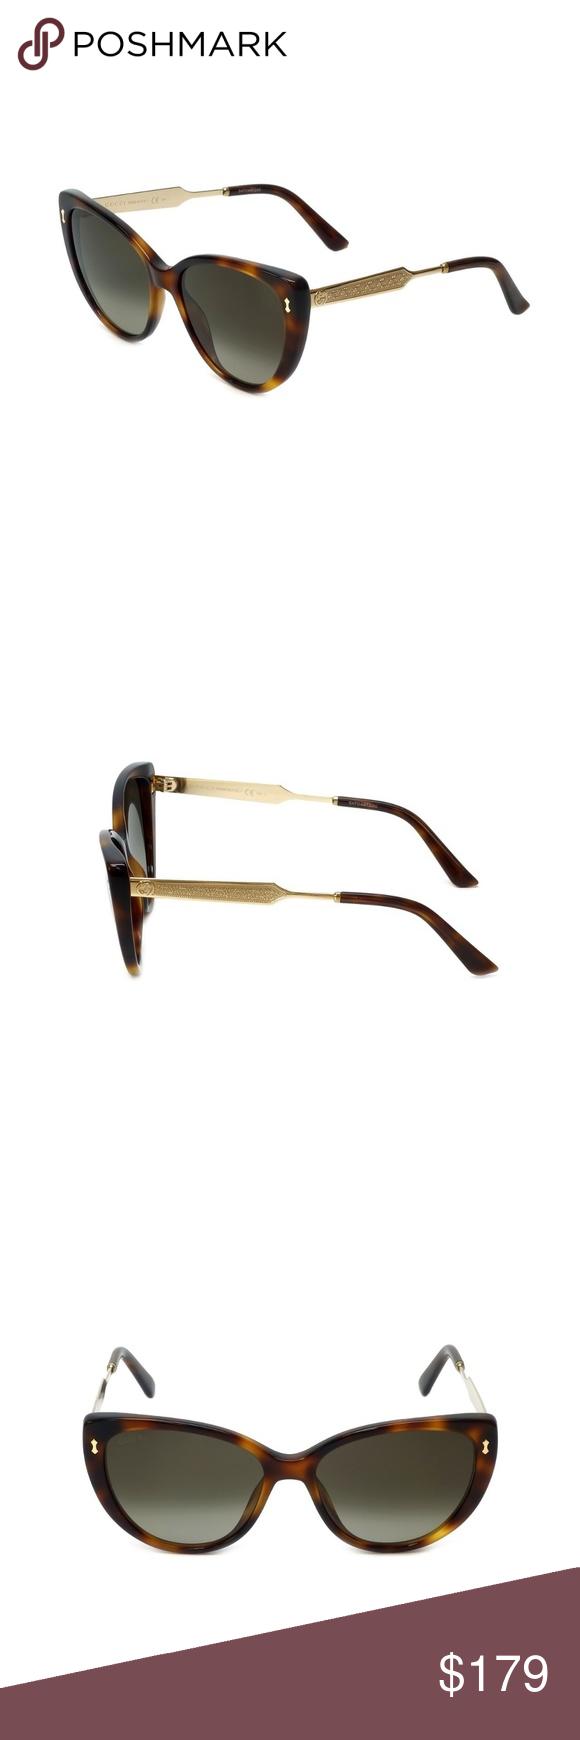 f0cf0ecc5ef Gucci Damascato Havana Gold Cat Eye Sunglasses Brand  Gucci Model GG 3804 S  CRXHA